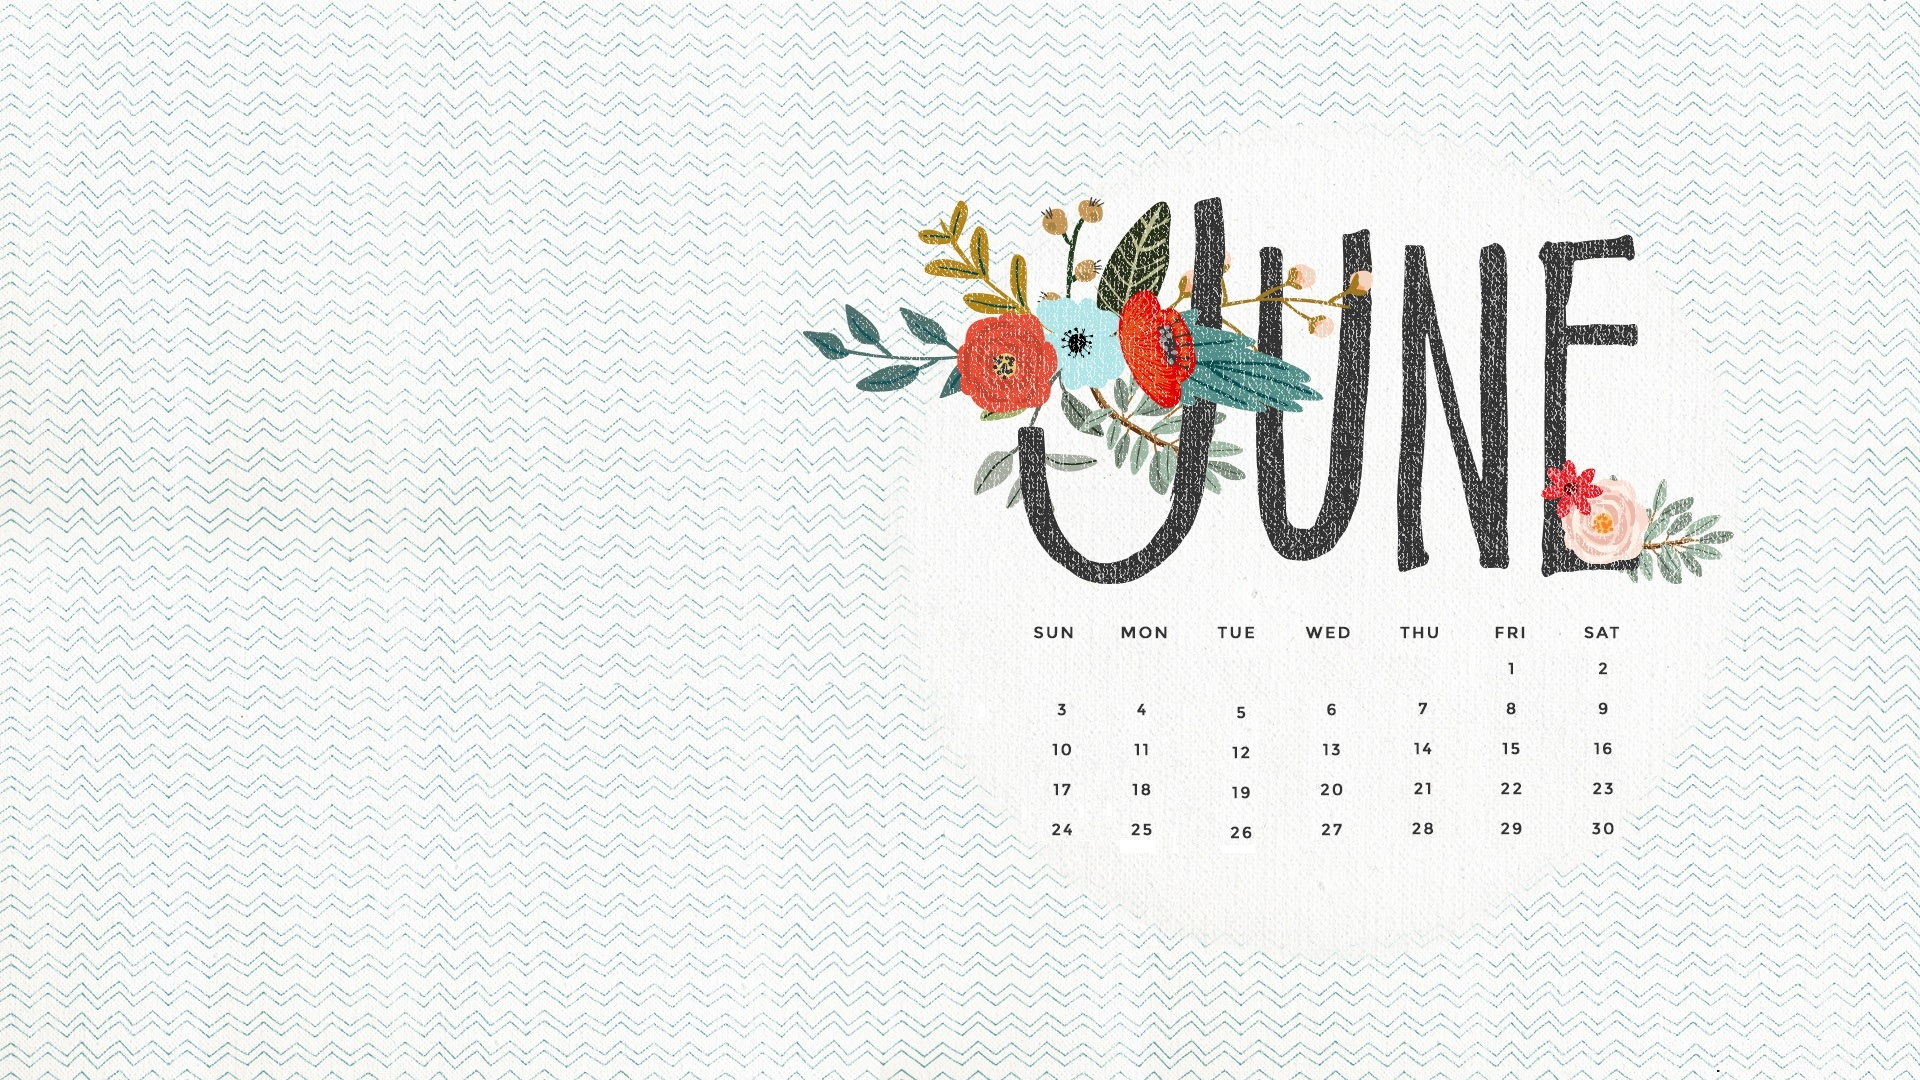 june 2019 hd wallpaper with calendar::June 2019 iPhone Calendar Wallpaper